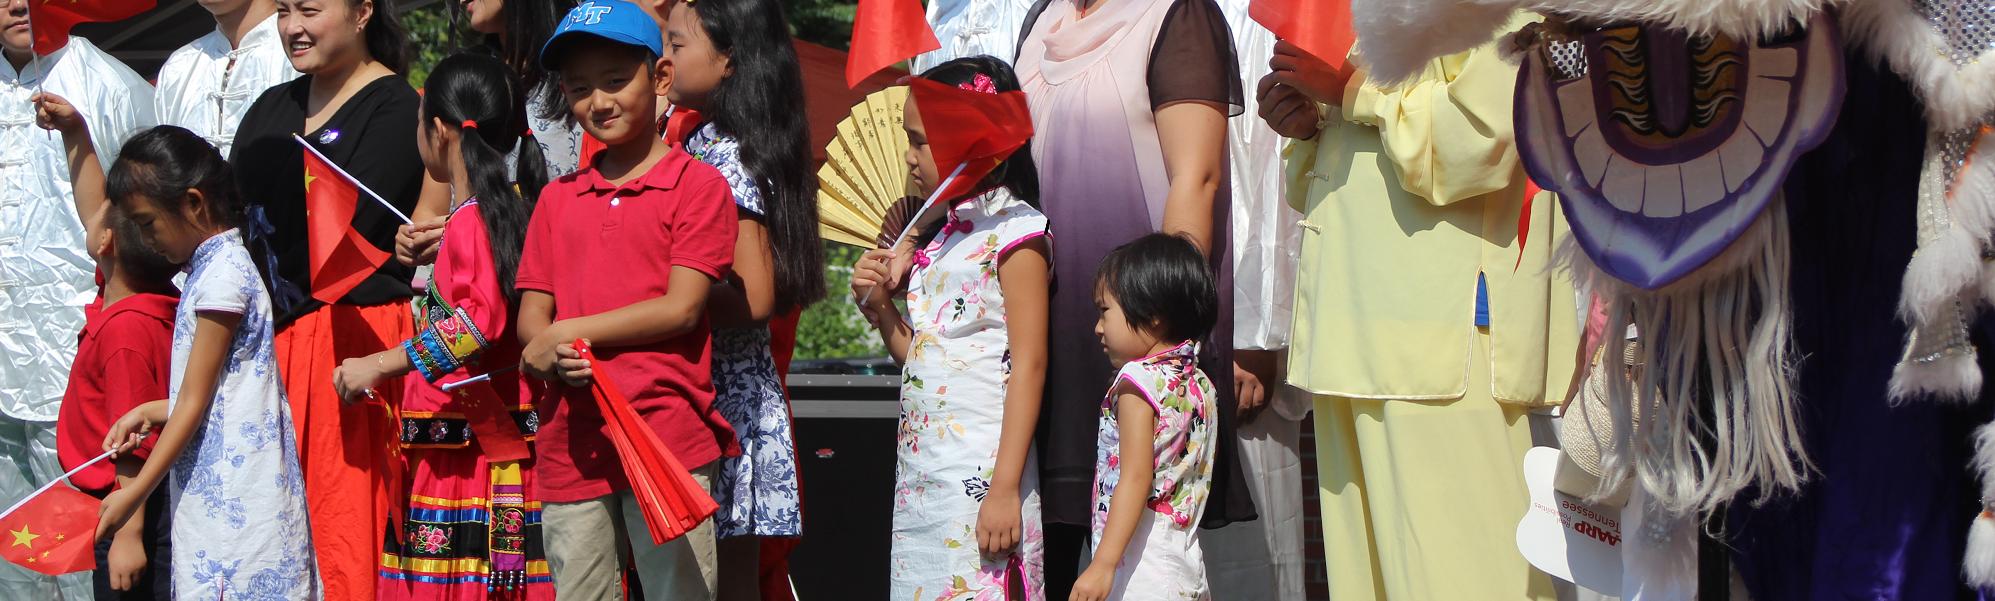 asian festival crowd